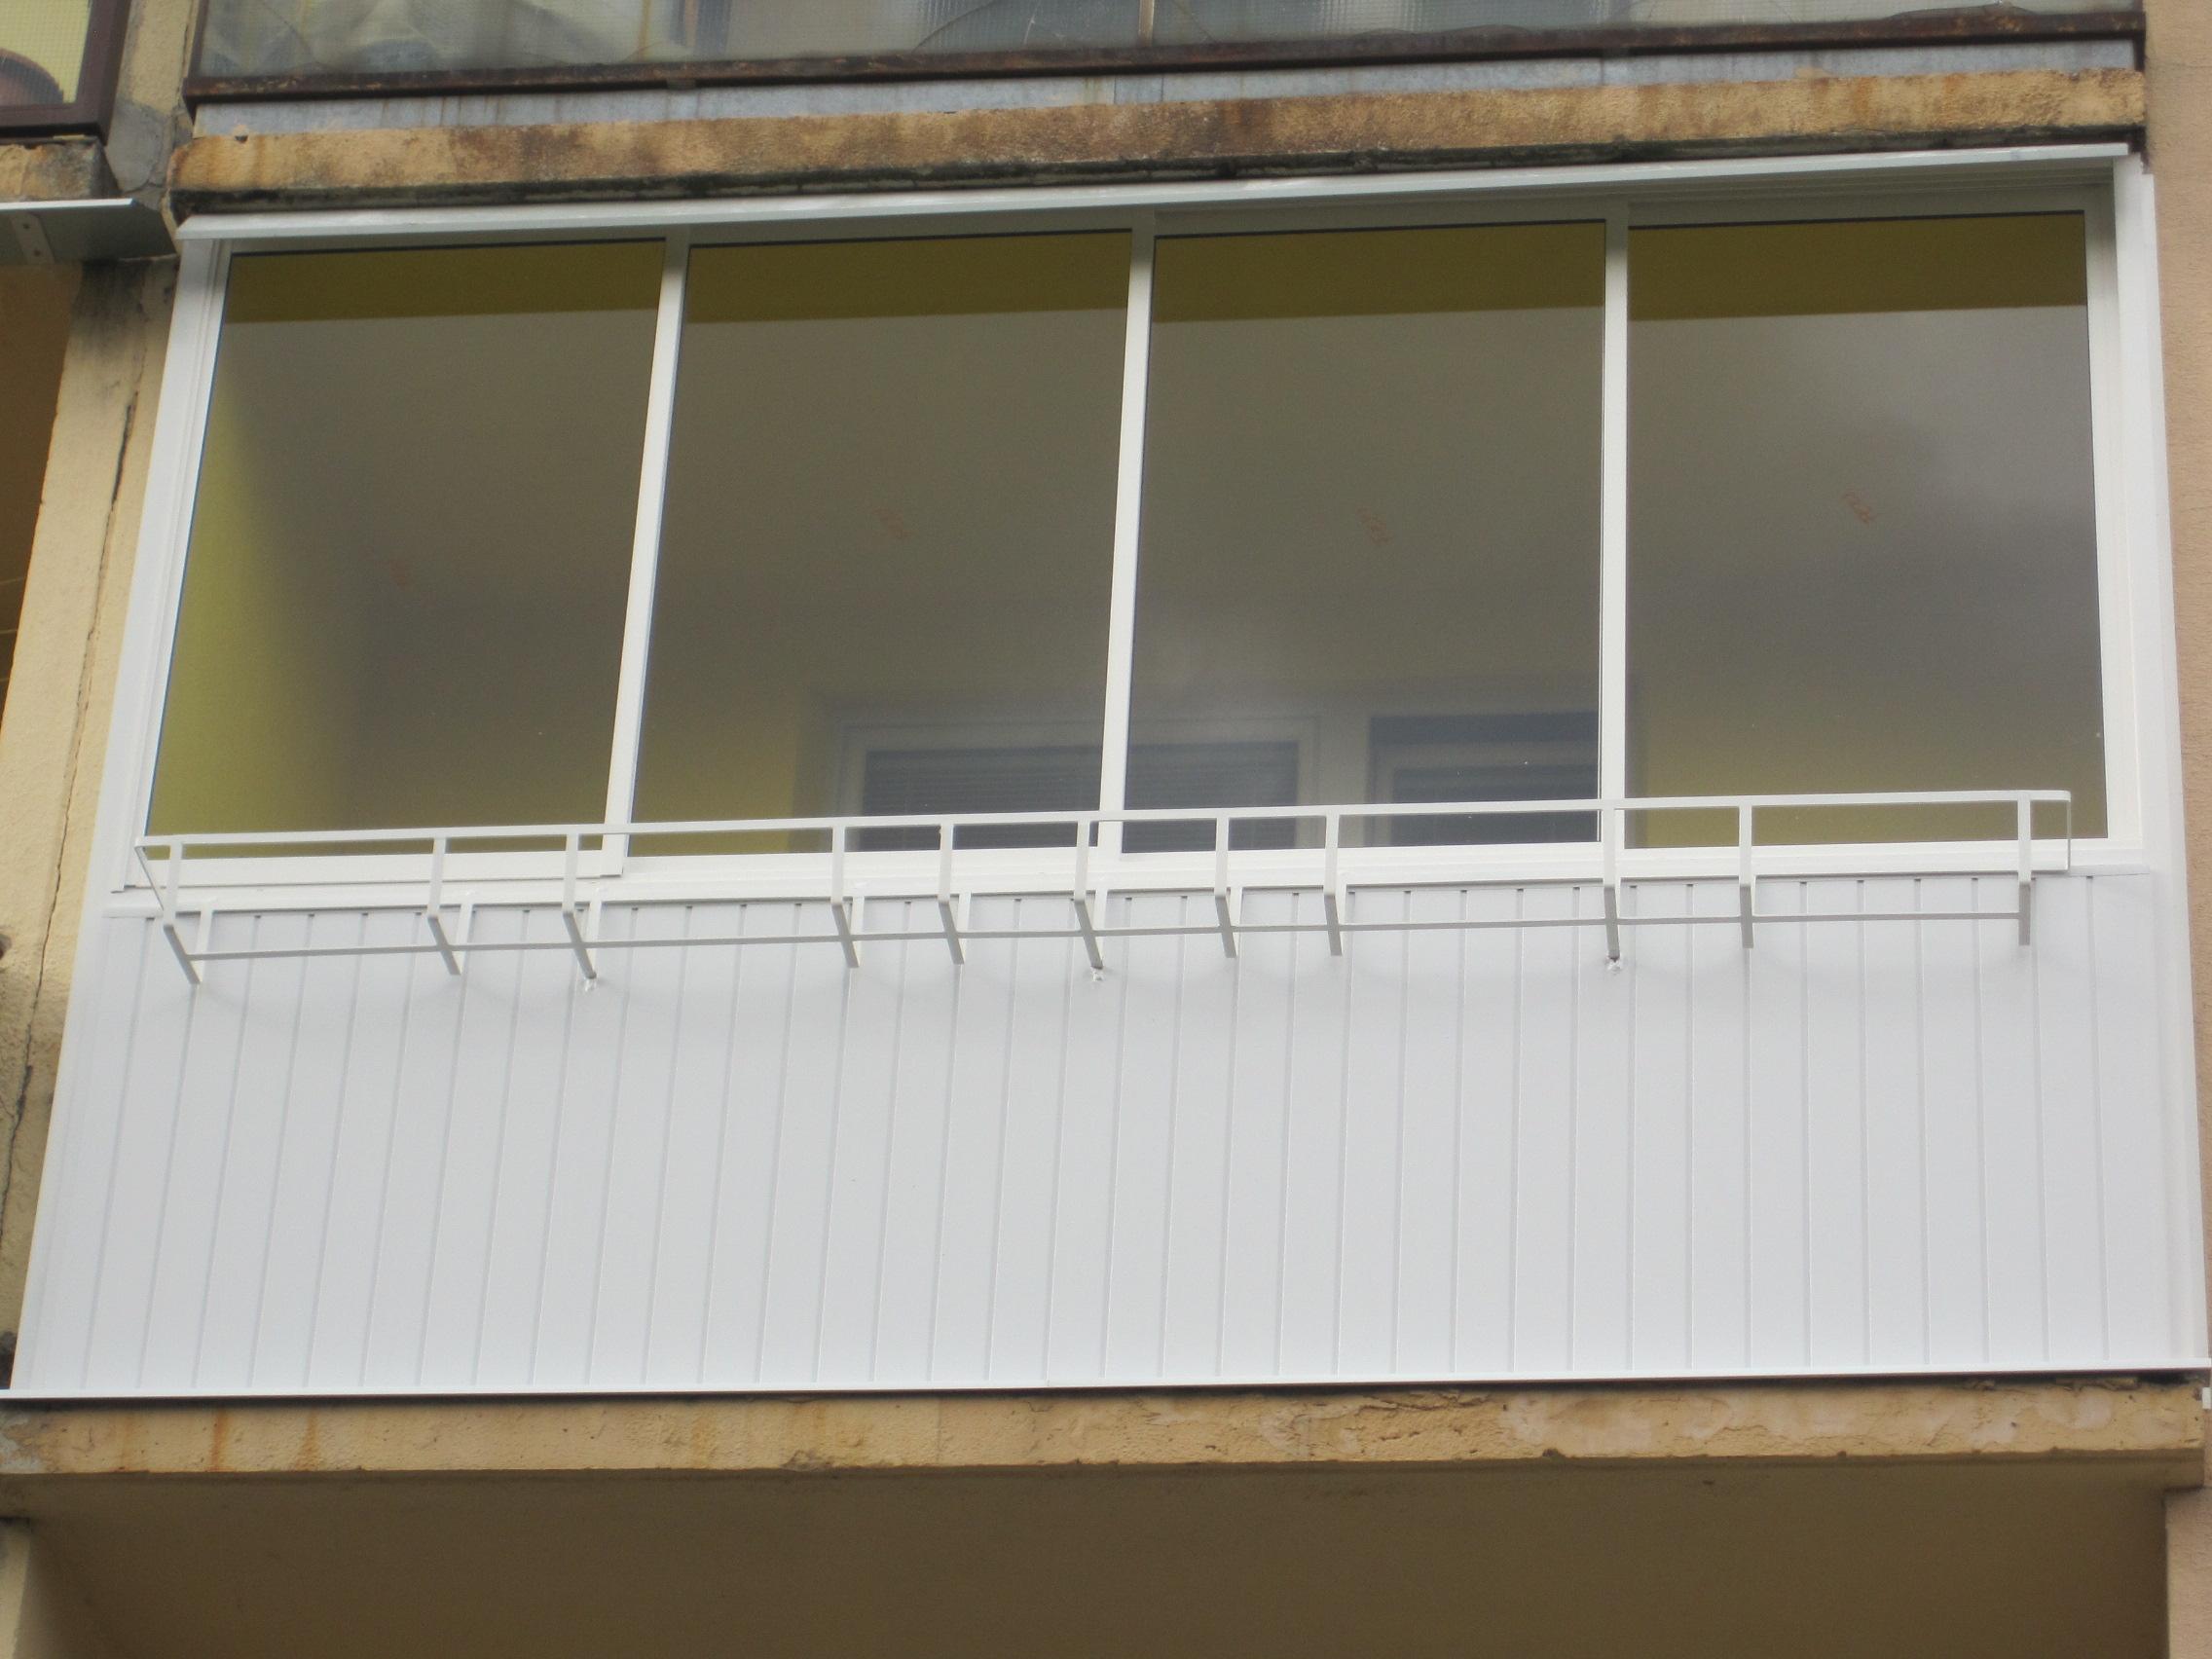 Balkonverglasung aluminiumkonstruktion rahmen schiebesystem pifema s r o - Trennwand schiebesystem ...